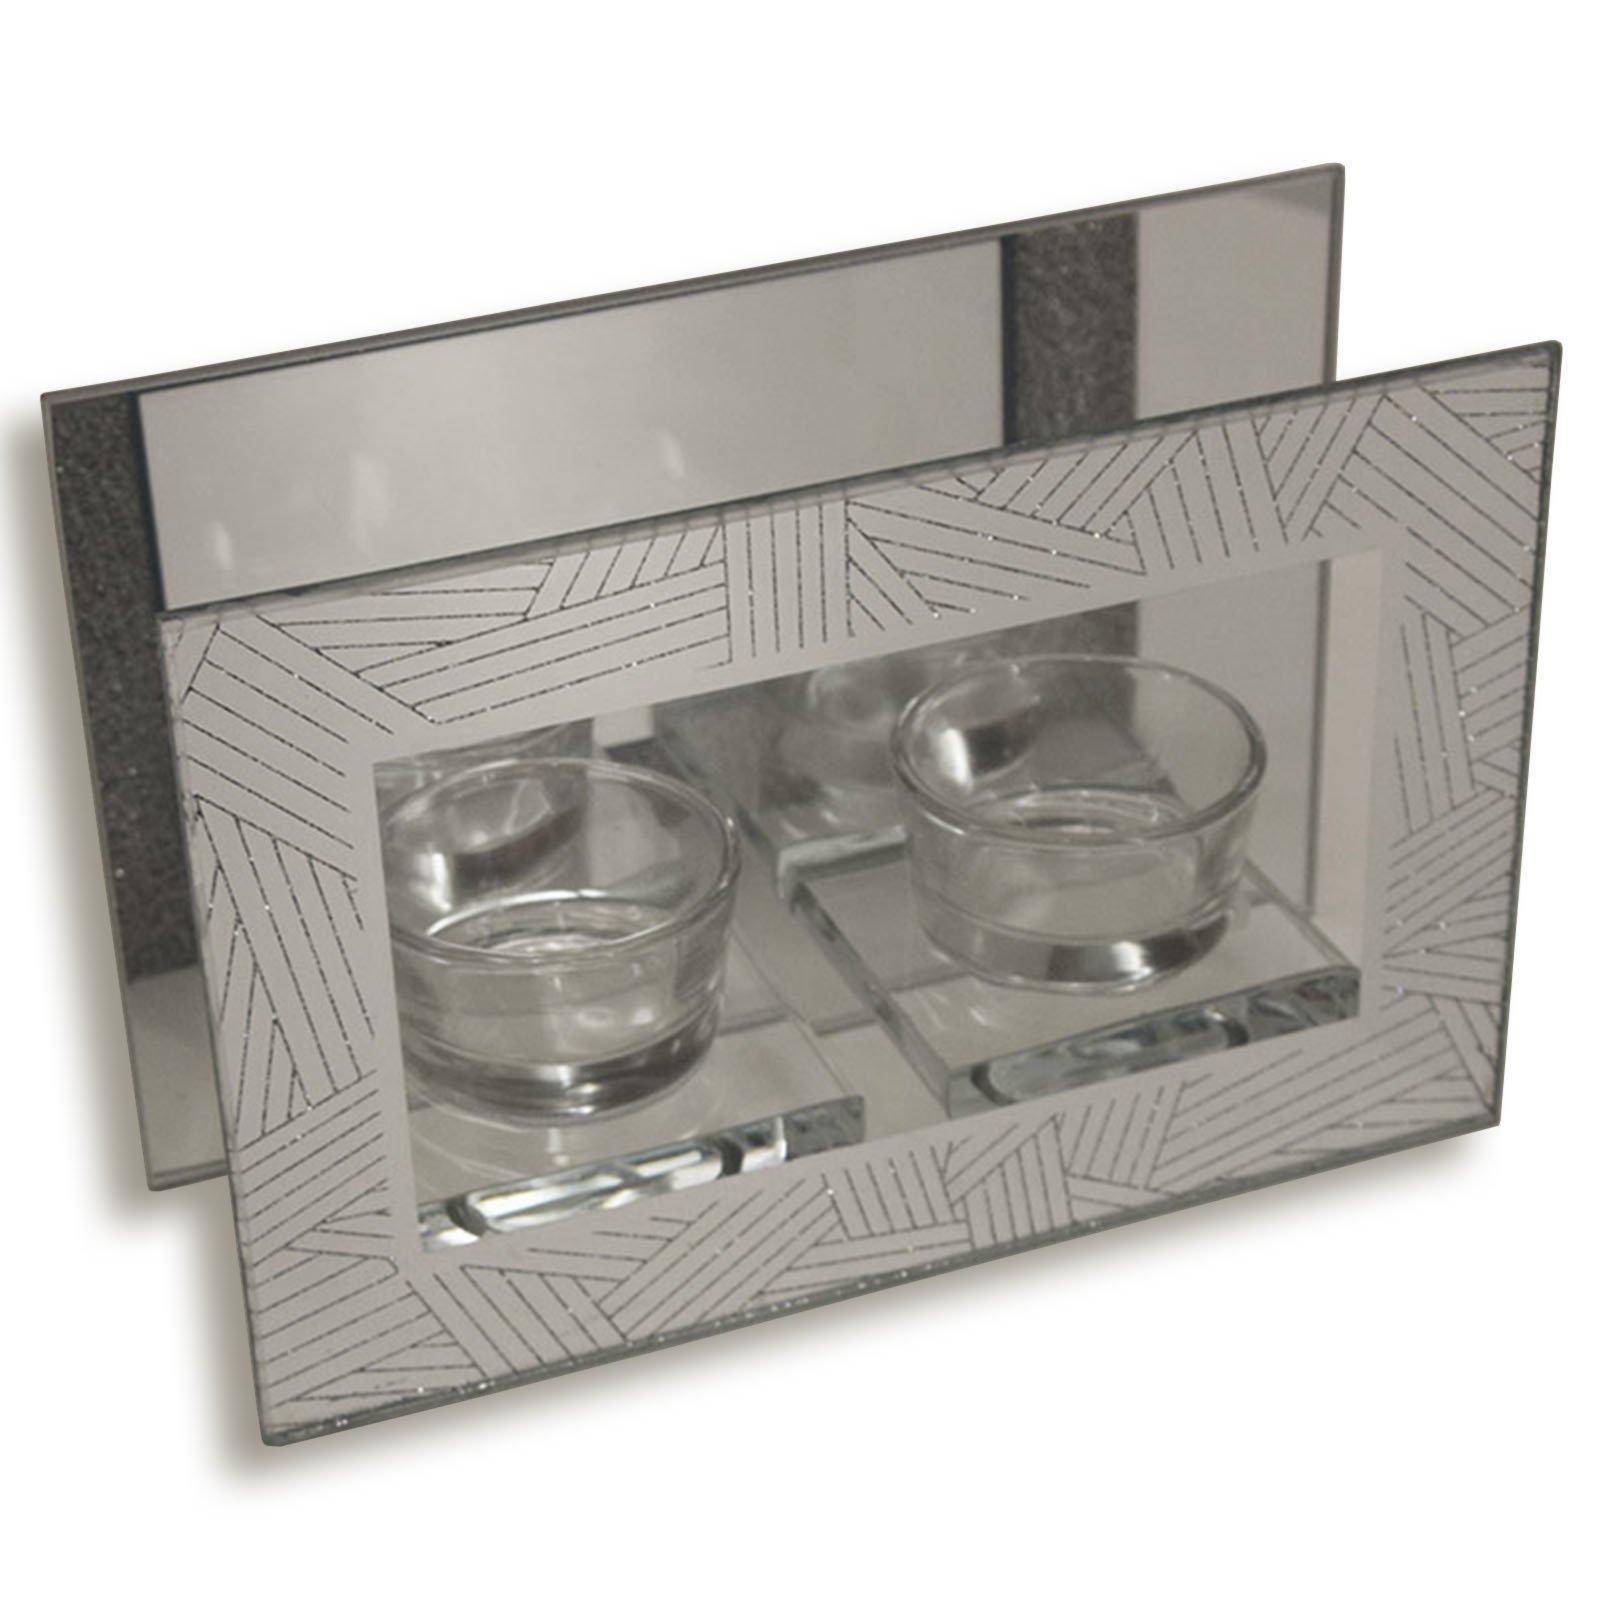 kerzenhalter silber f r 2 teelichter kerzen kerzenhalter deko artikel deko. Black Bedroom Furniture Sets. Home Design Ideas